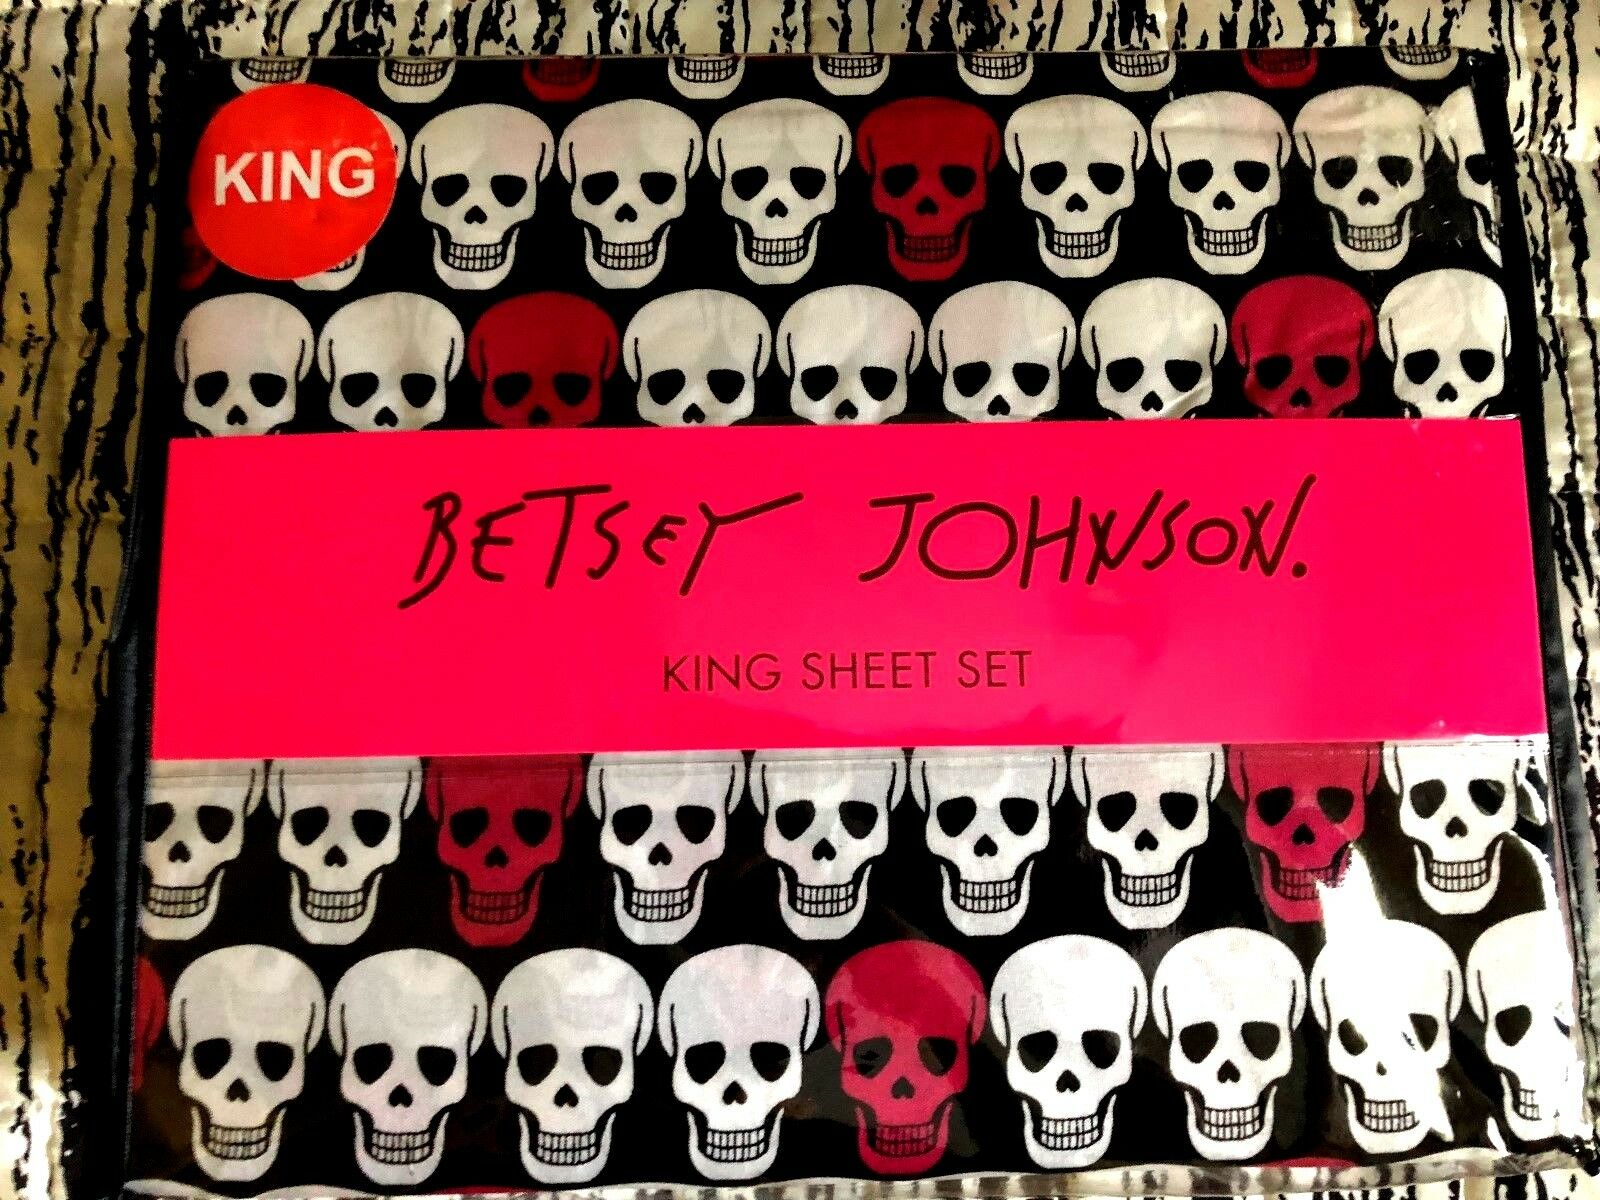 Betsey Johnson Skull Heads King Sheet Set NWT